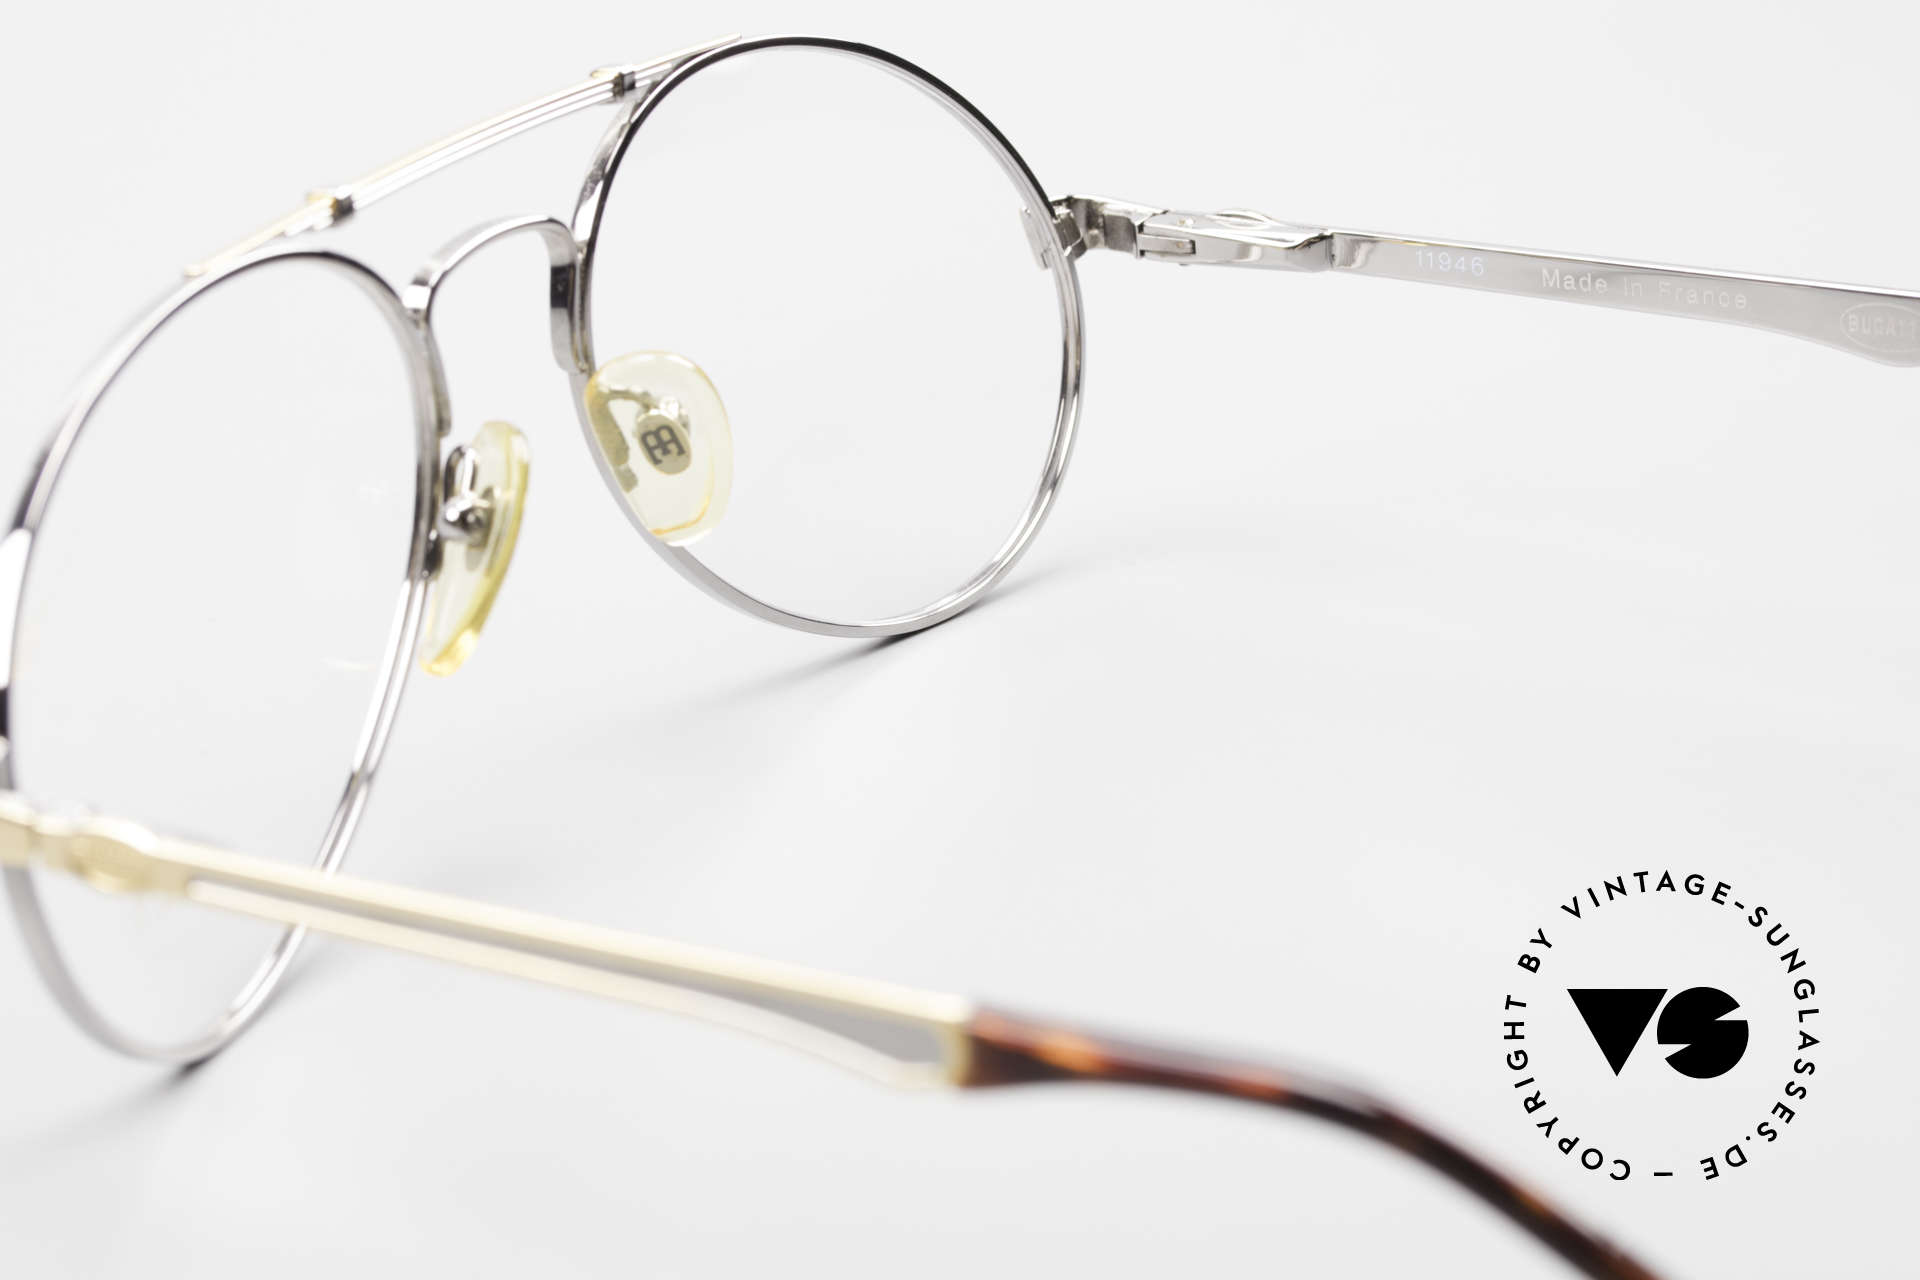 Bugatti 11946 Large 80's Luxury Eyeglasses, NO RETRO sunglasses; but a costly 80's Original!, Made for Men